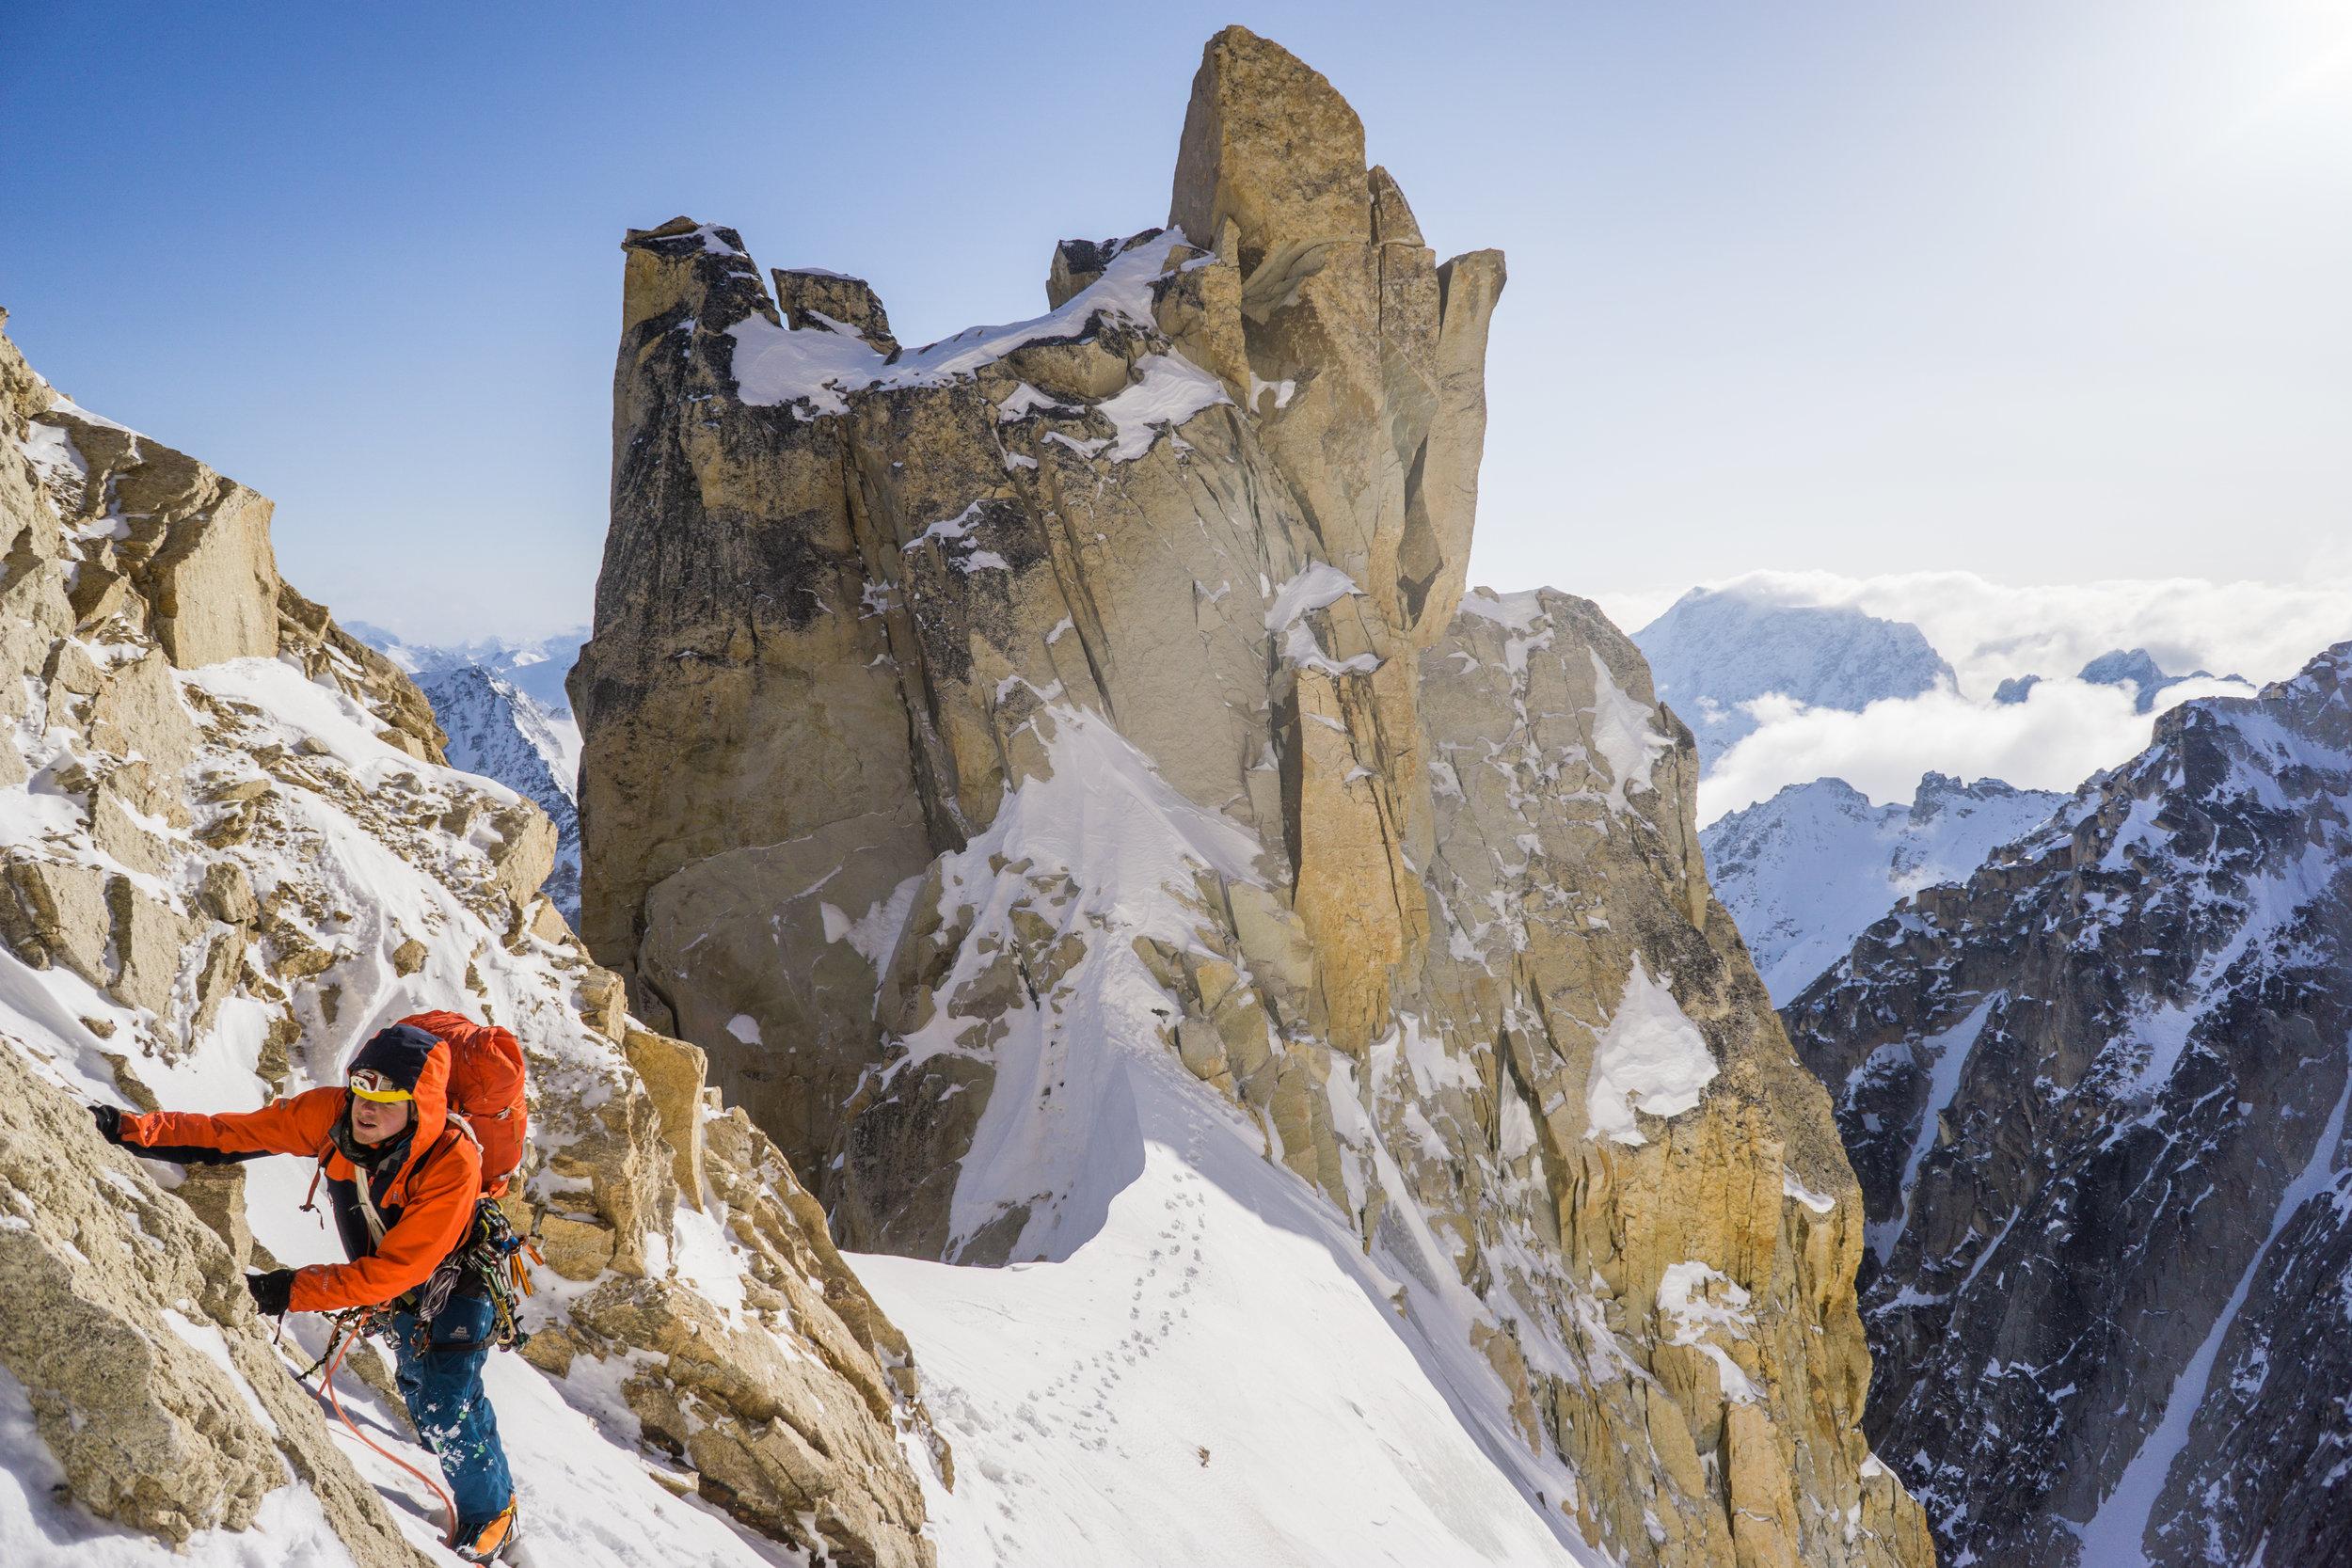 Uisdean Hawthorn on 'Fun or Fear' (ED2), Mt. Jezebel, Revelation Mountains, Alaska. First ascent.